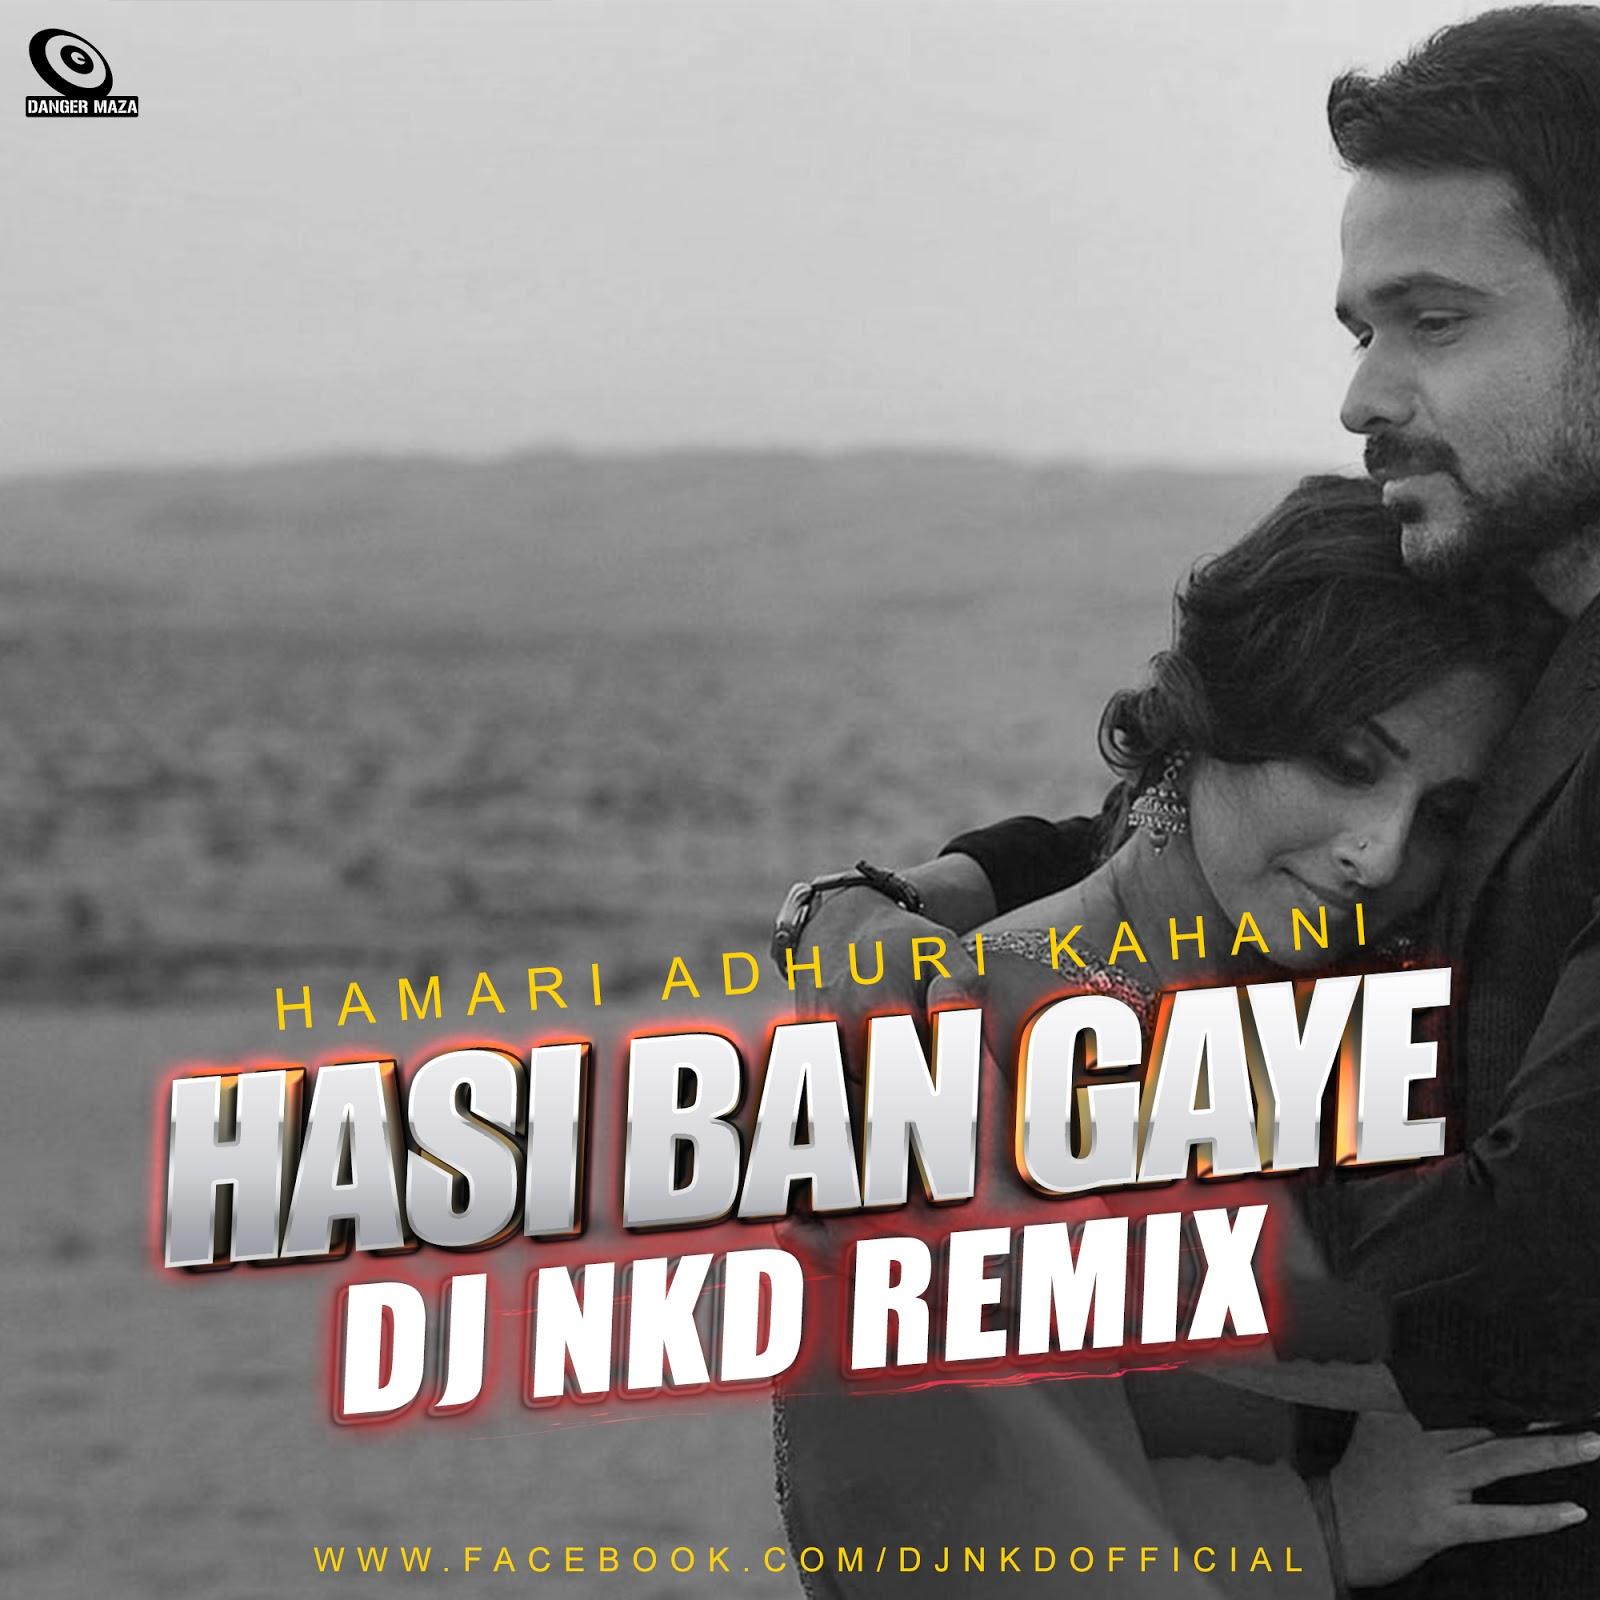 Hasi Ban Gye P3 Download: Hamari Adhuri Kahani